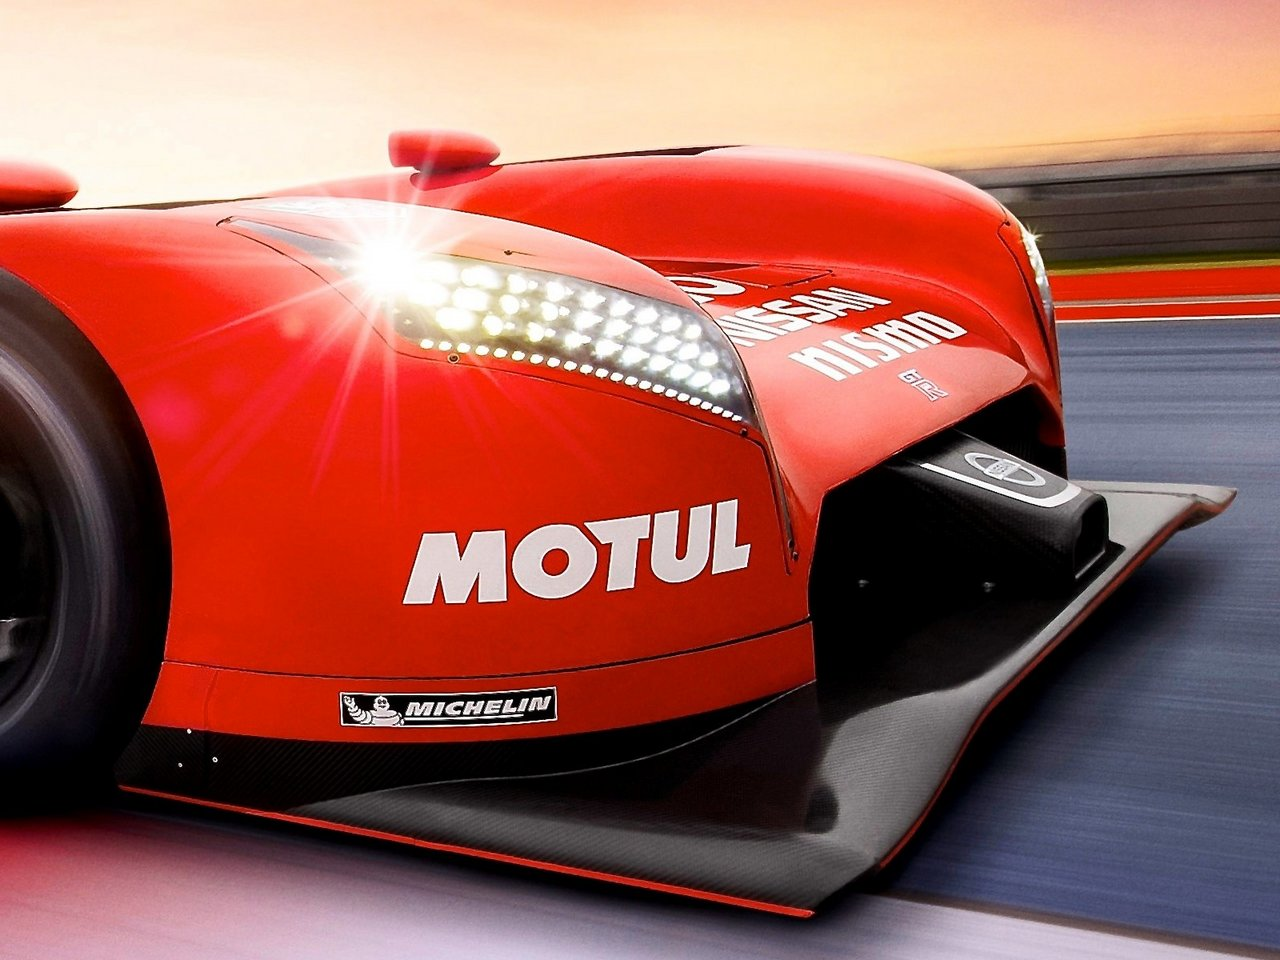 nissan-gt-r_lm-nismo-le-mans-2015-world-endurance-racing-hybrid-0-100_11